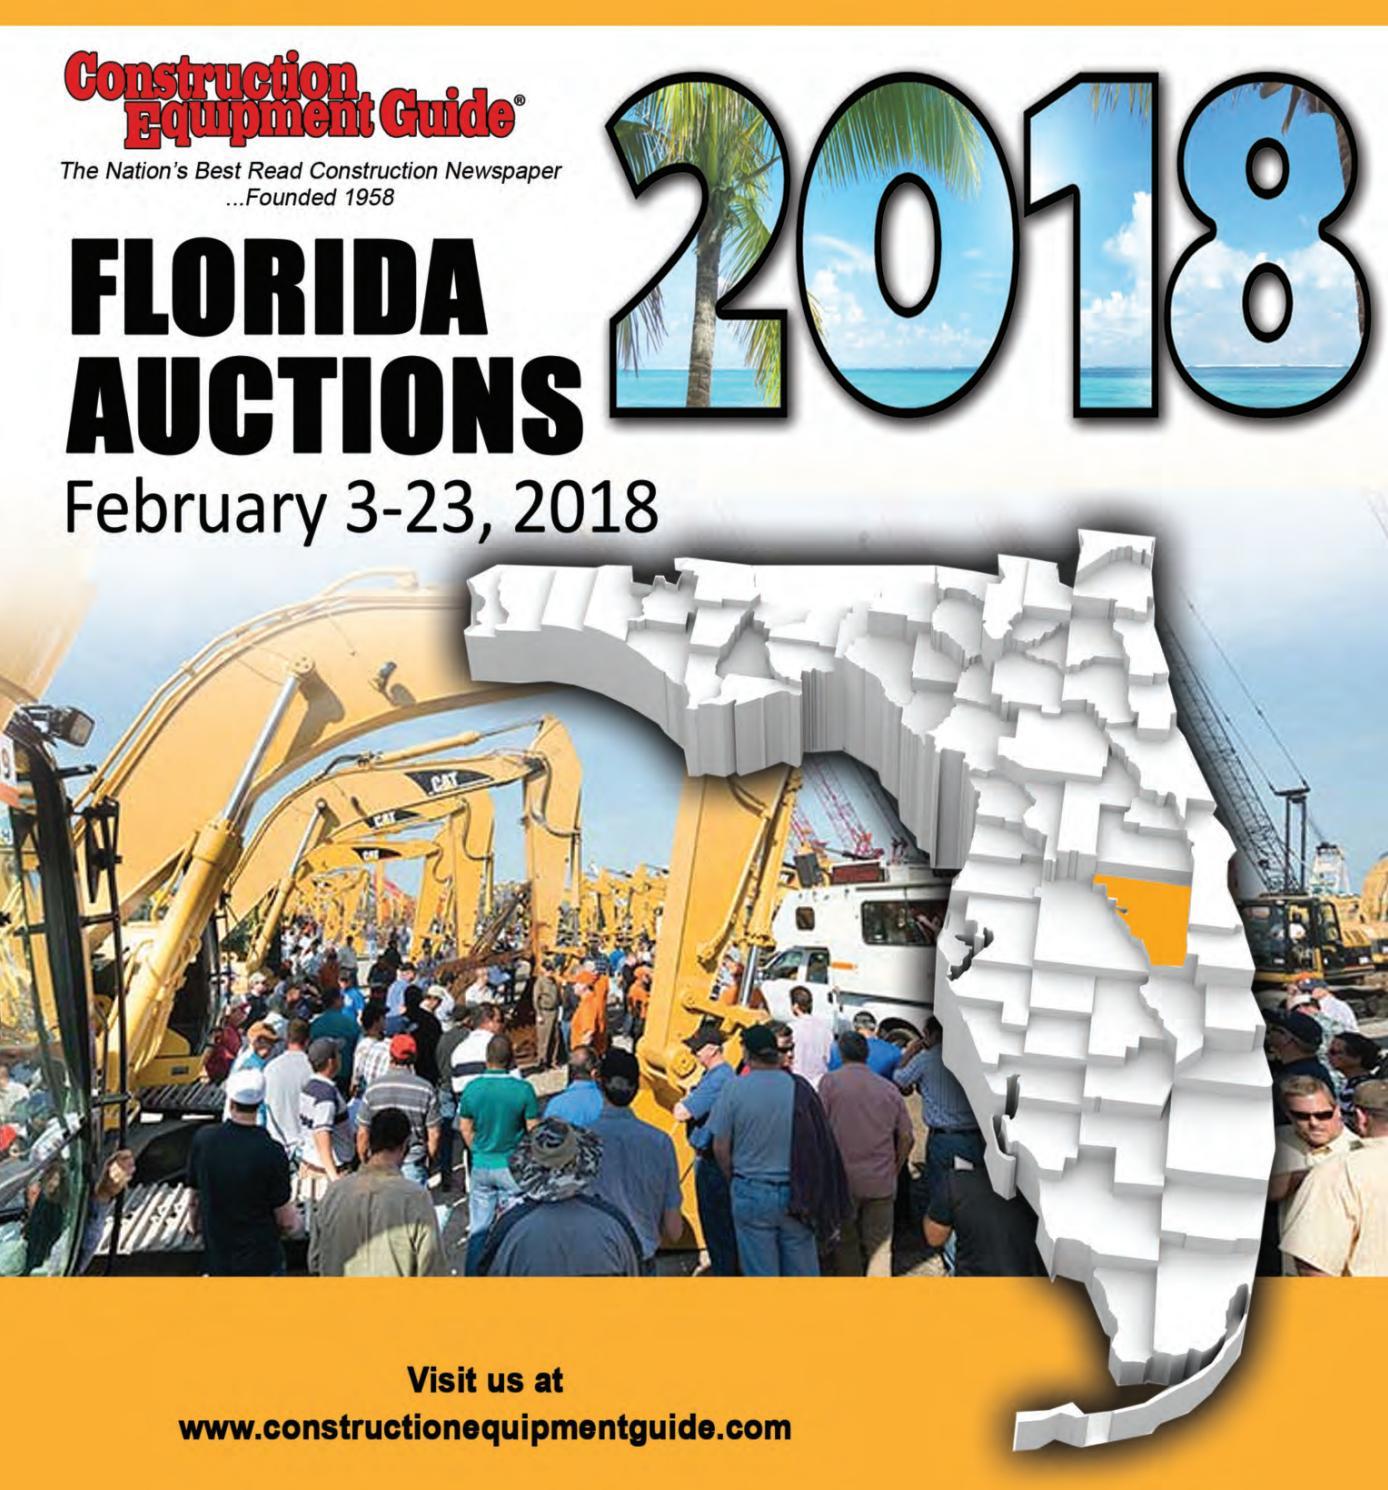 Florida Auctions 2018